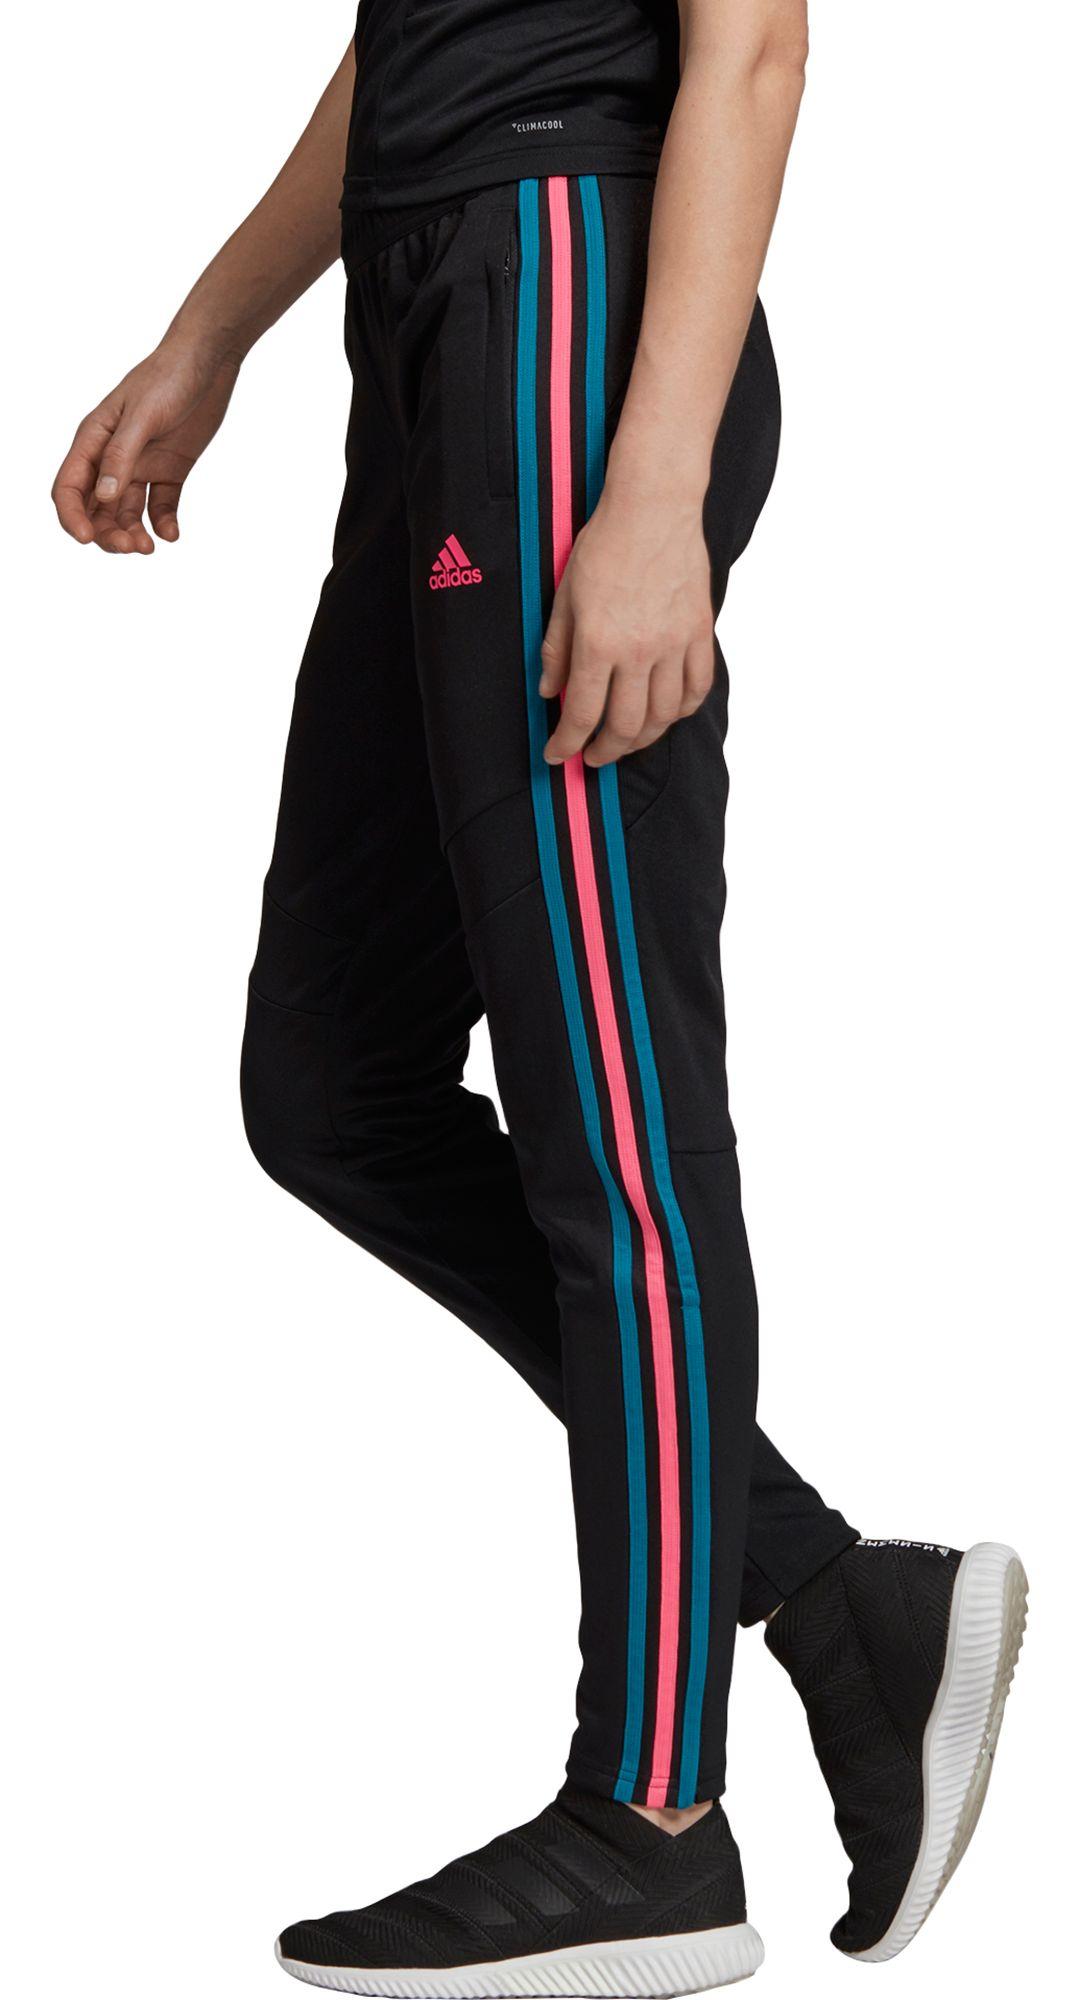 big sale 548cf 9c176 adidas Women's Tiro 19 Training Pants | DICK'S Sporting Goods